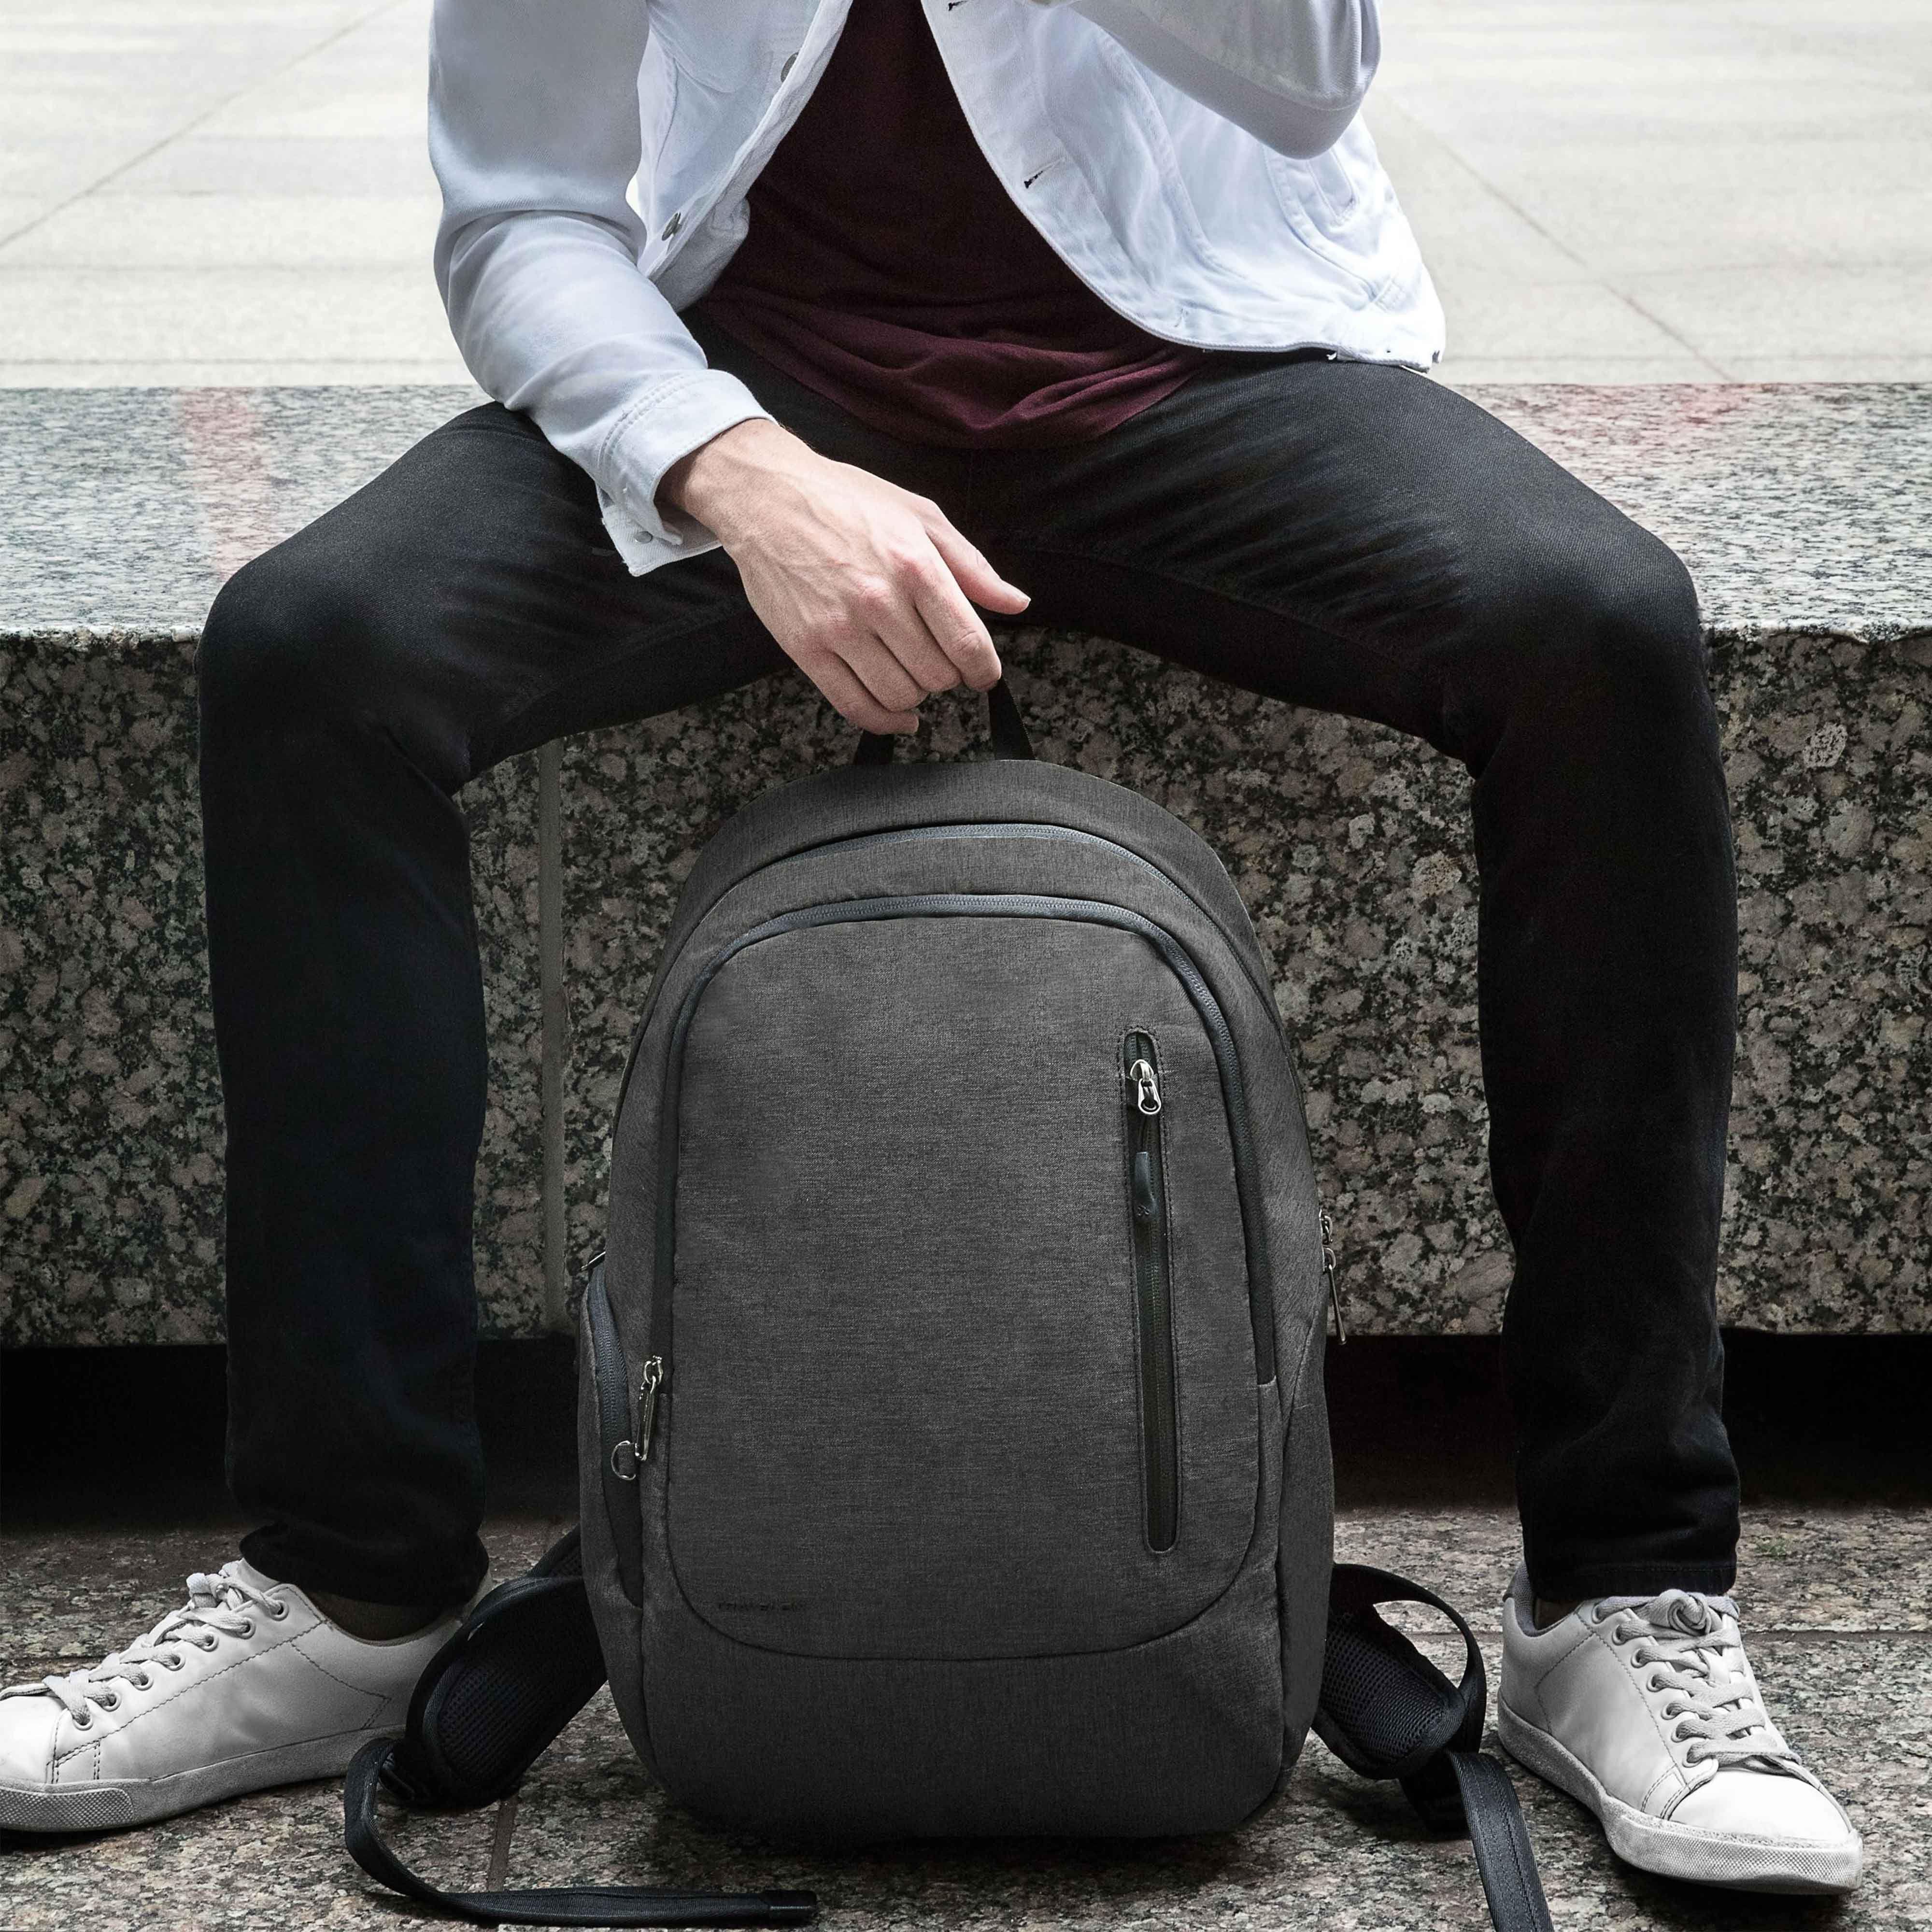 Anti-Theft Urban® Backpack